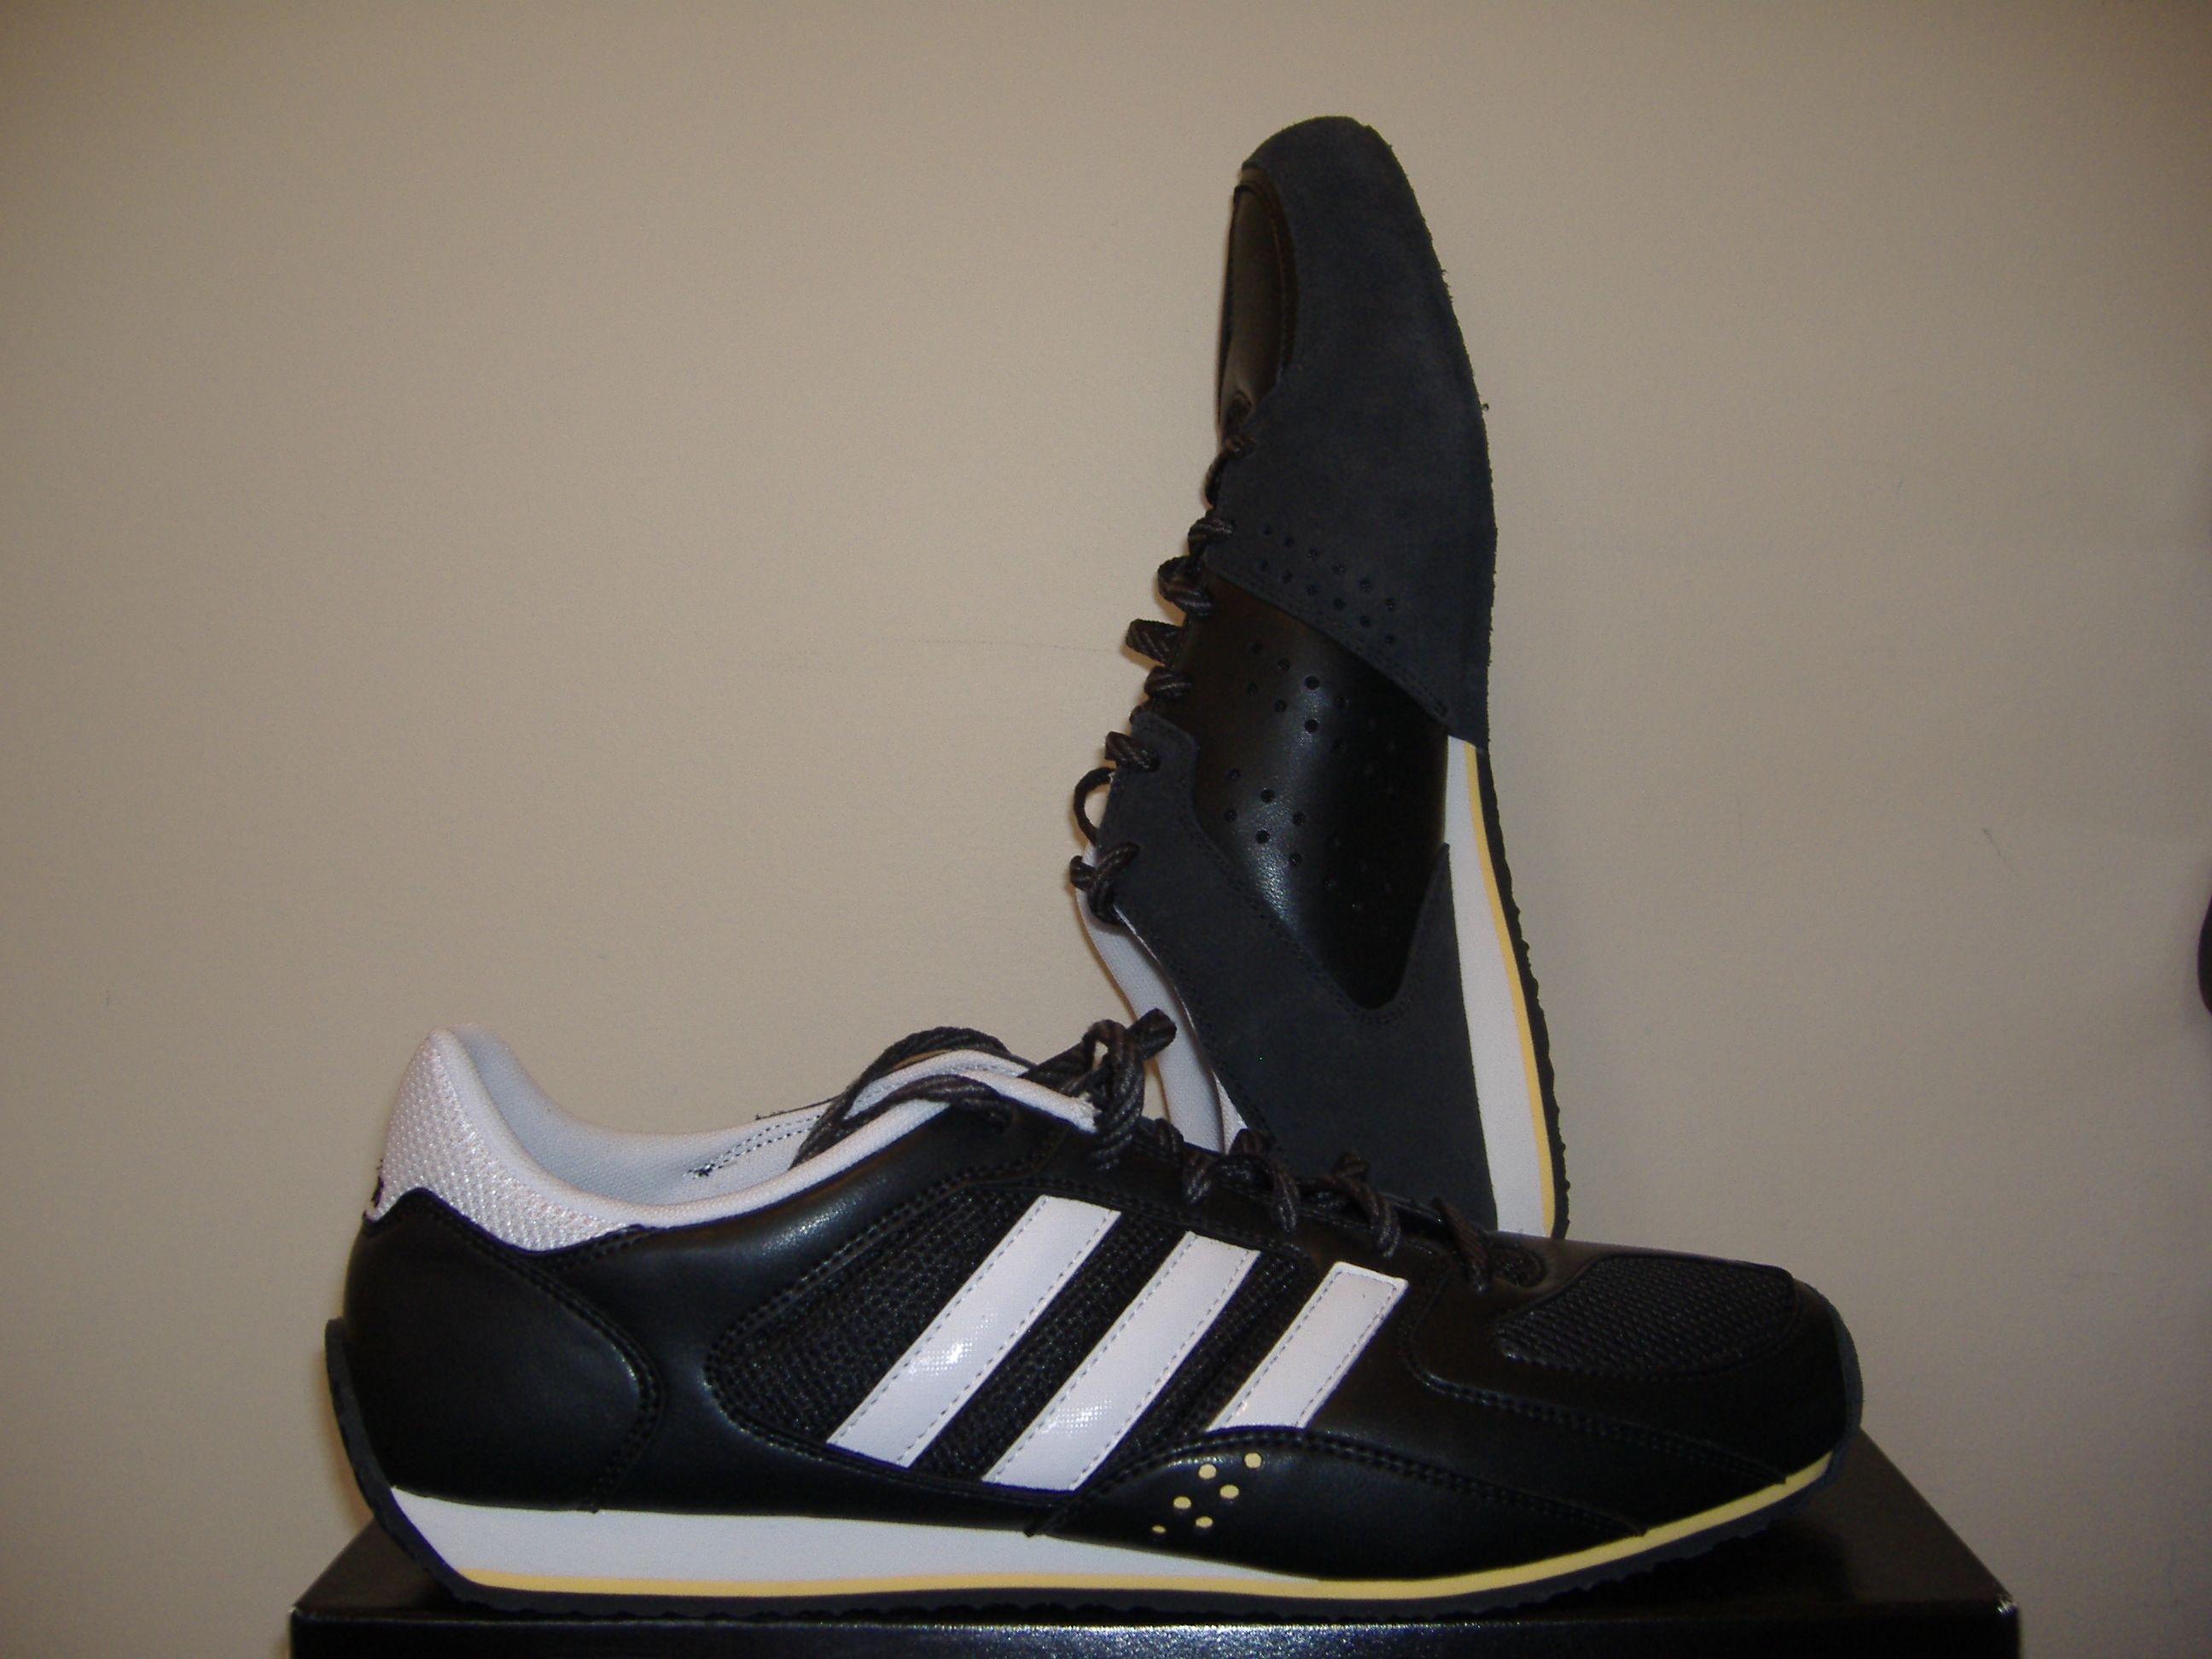 0cb433121115 Imagini pentru adidas en garde touche Fencing